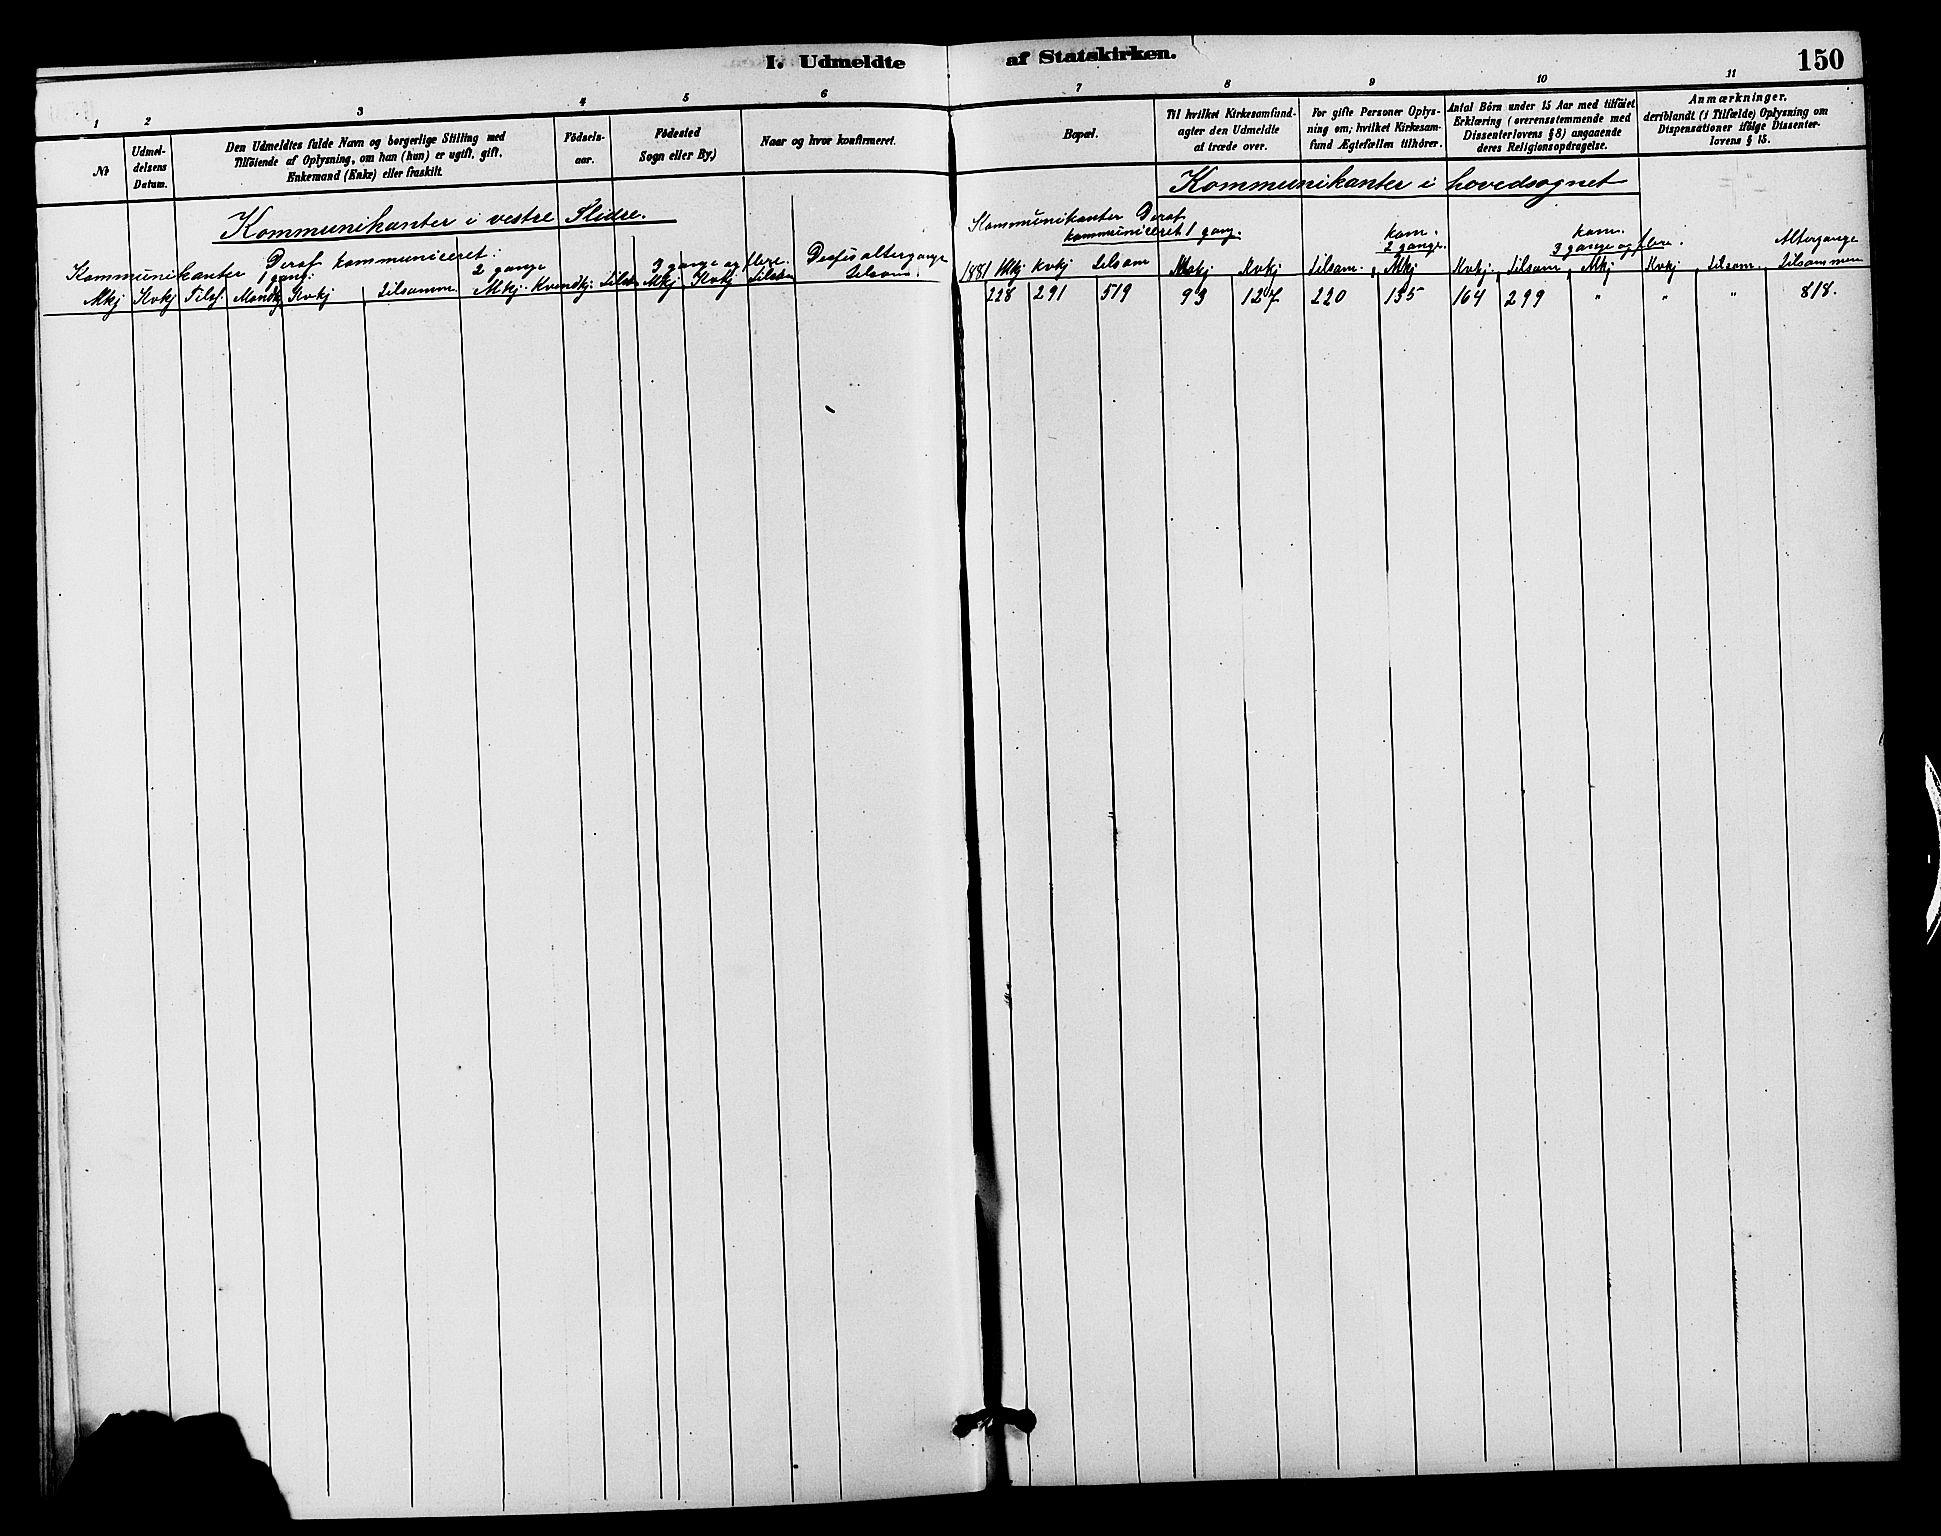 SAH, Vestre Slidre prestekontor, Klokkerbok nr. 4, 1881-1912, s. 150